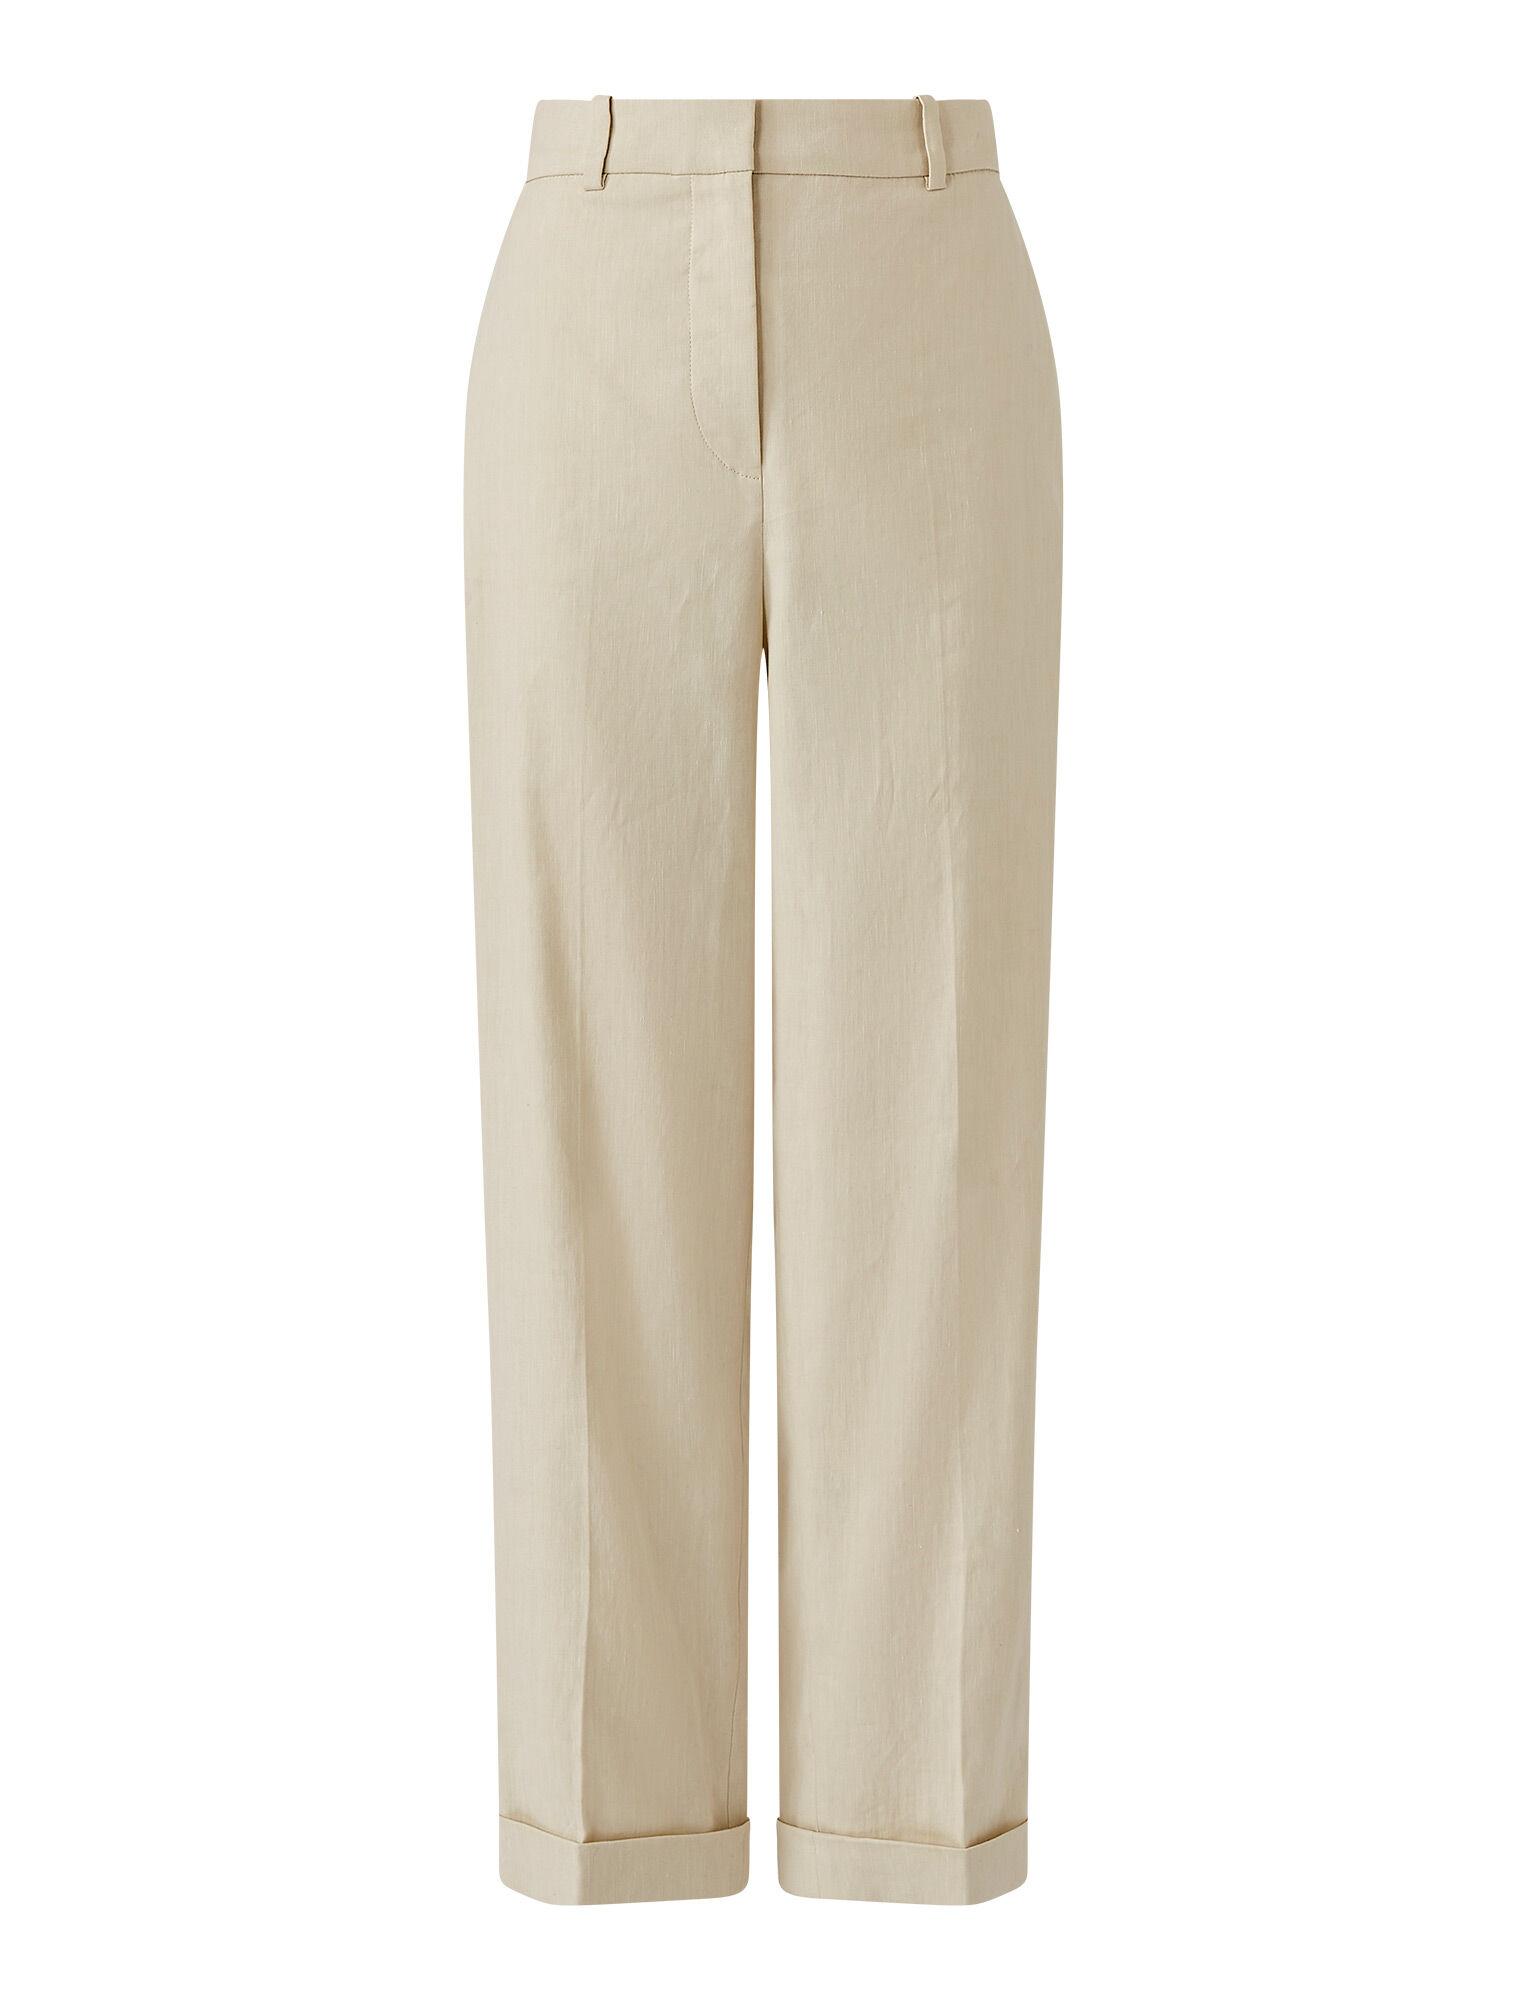 Joseph, Stretch Linen Cotton Trina Trousers, in OAT